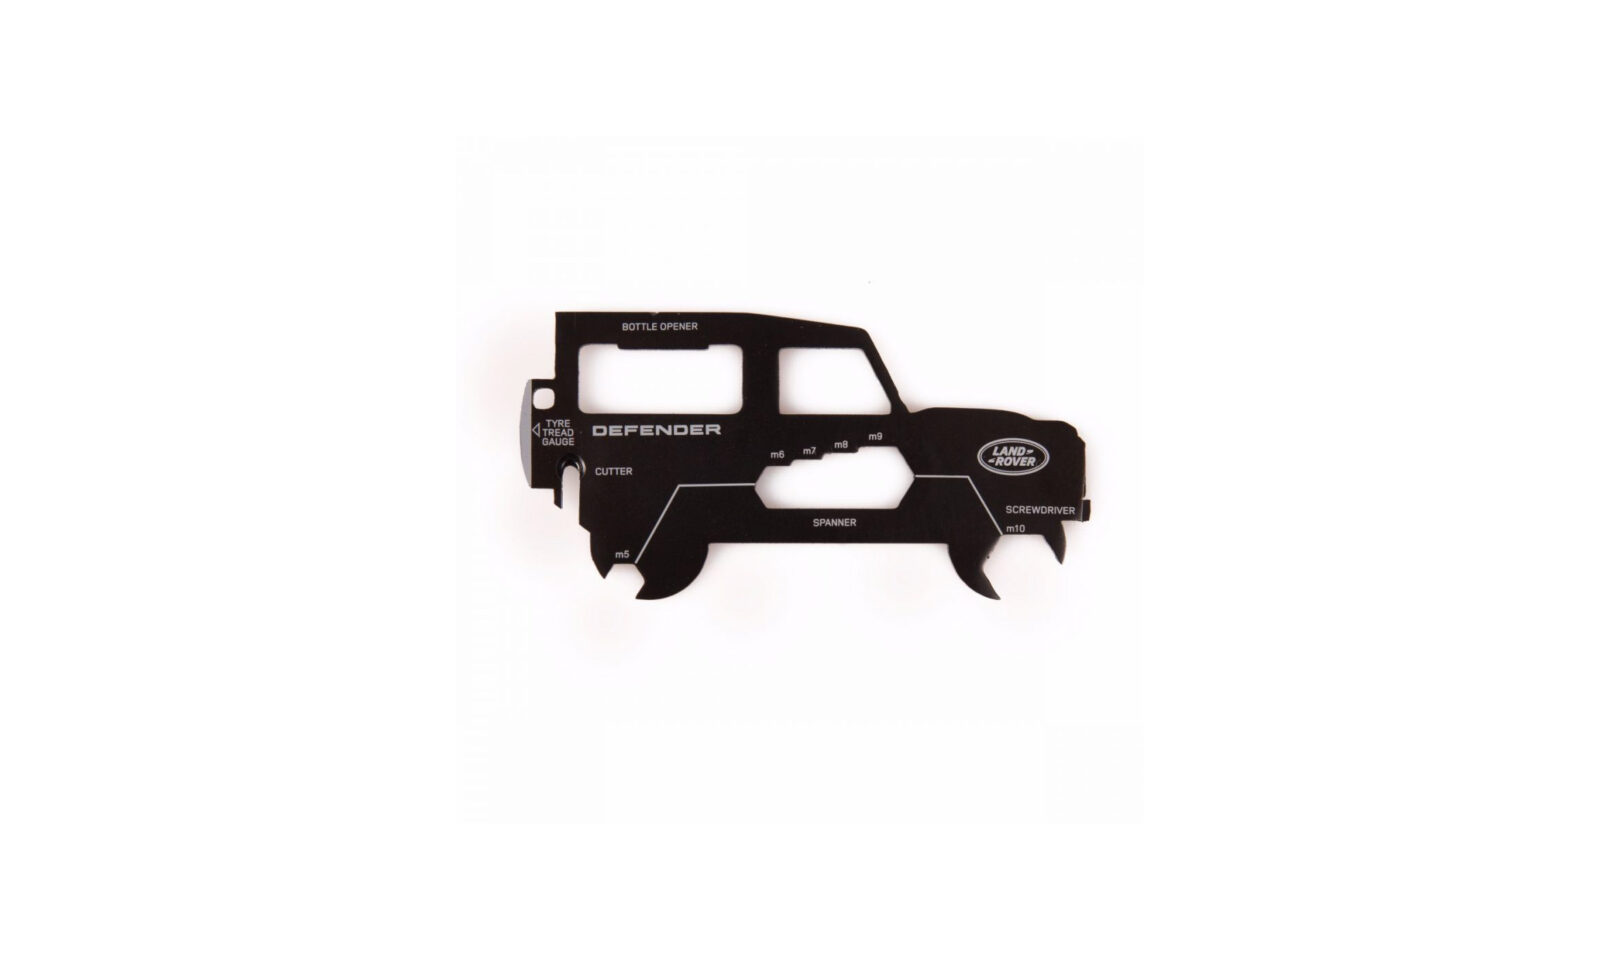 Land Rover Defender Multi Tool 1600x962 - Land Rover Defender Multi Tool